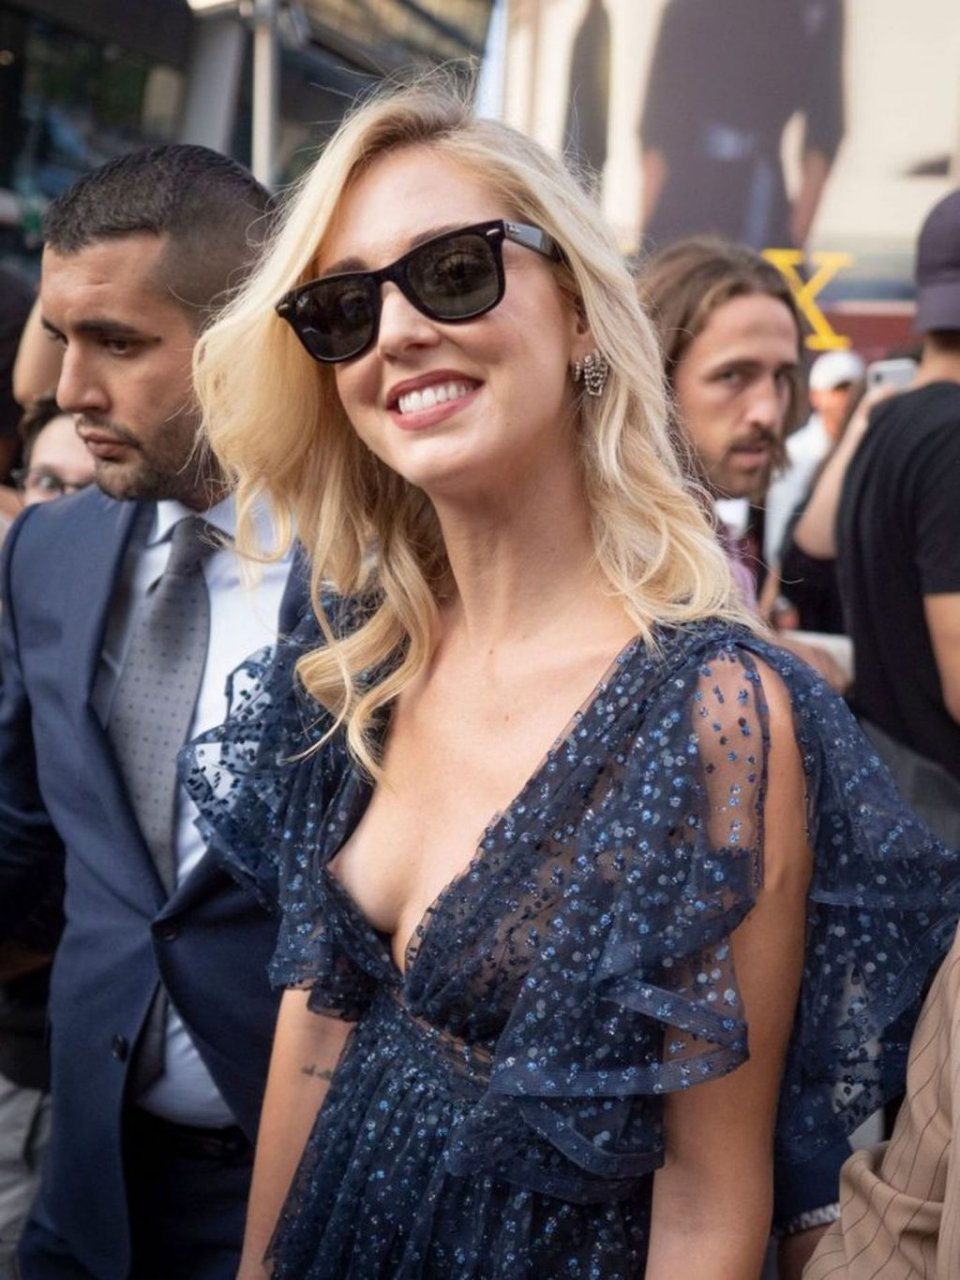 Chiara Ferragni Nip Slip (13 Photos)